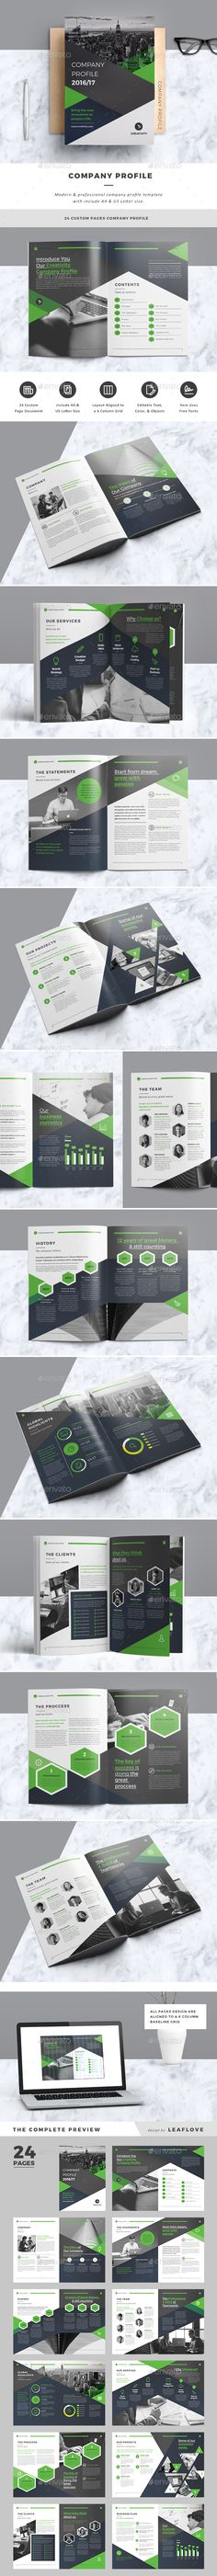 Company Profile by LeafLove https://graphicriver.net/item/company-profile/17831693?ref=fisihsani